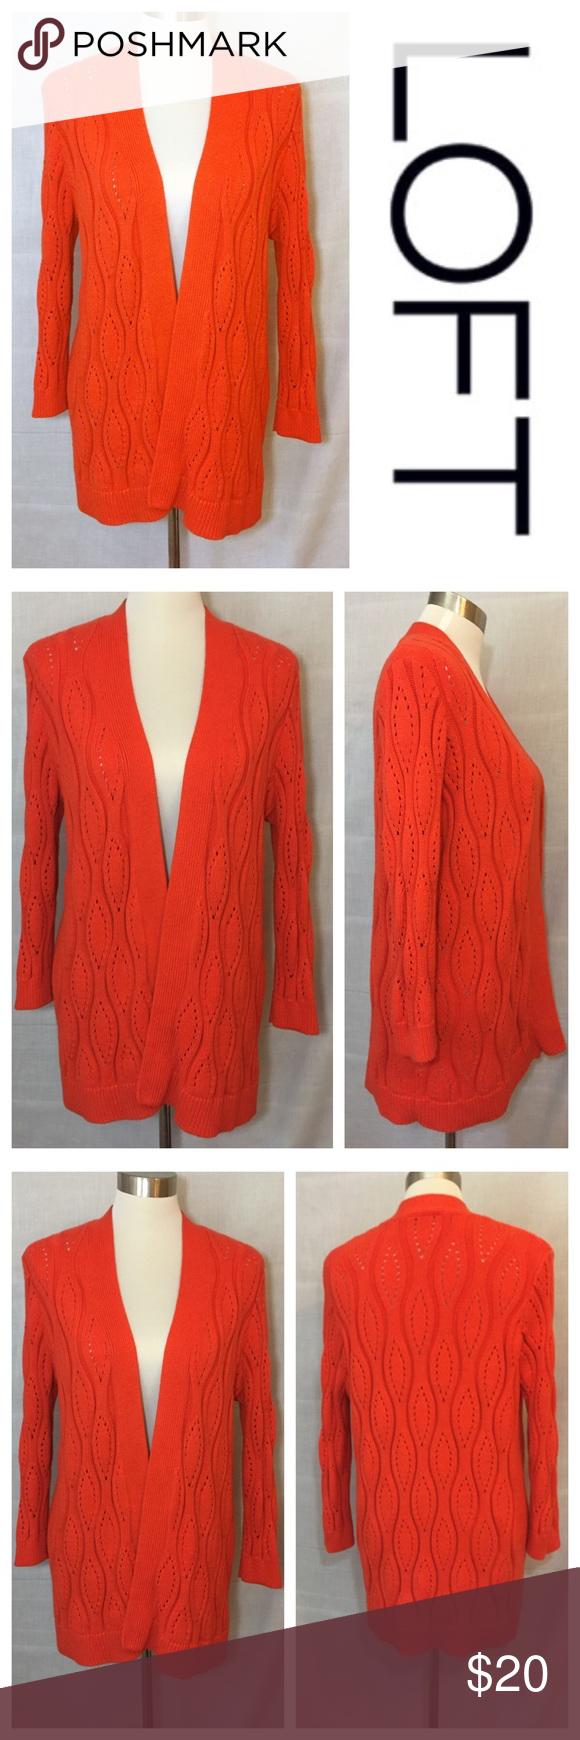 Loft Cardigan Sweater Orange Wavy Cabled Cotton L | Red orange ...